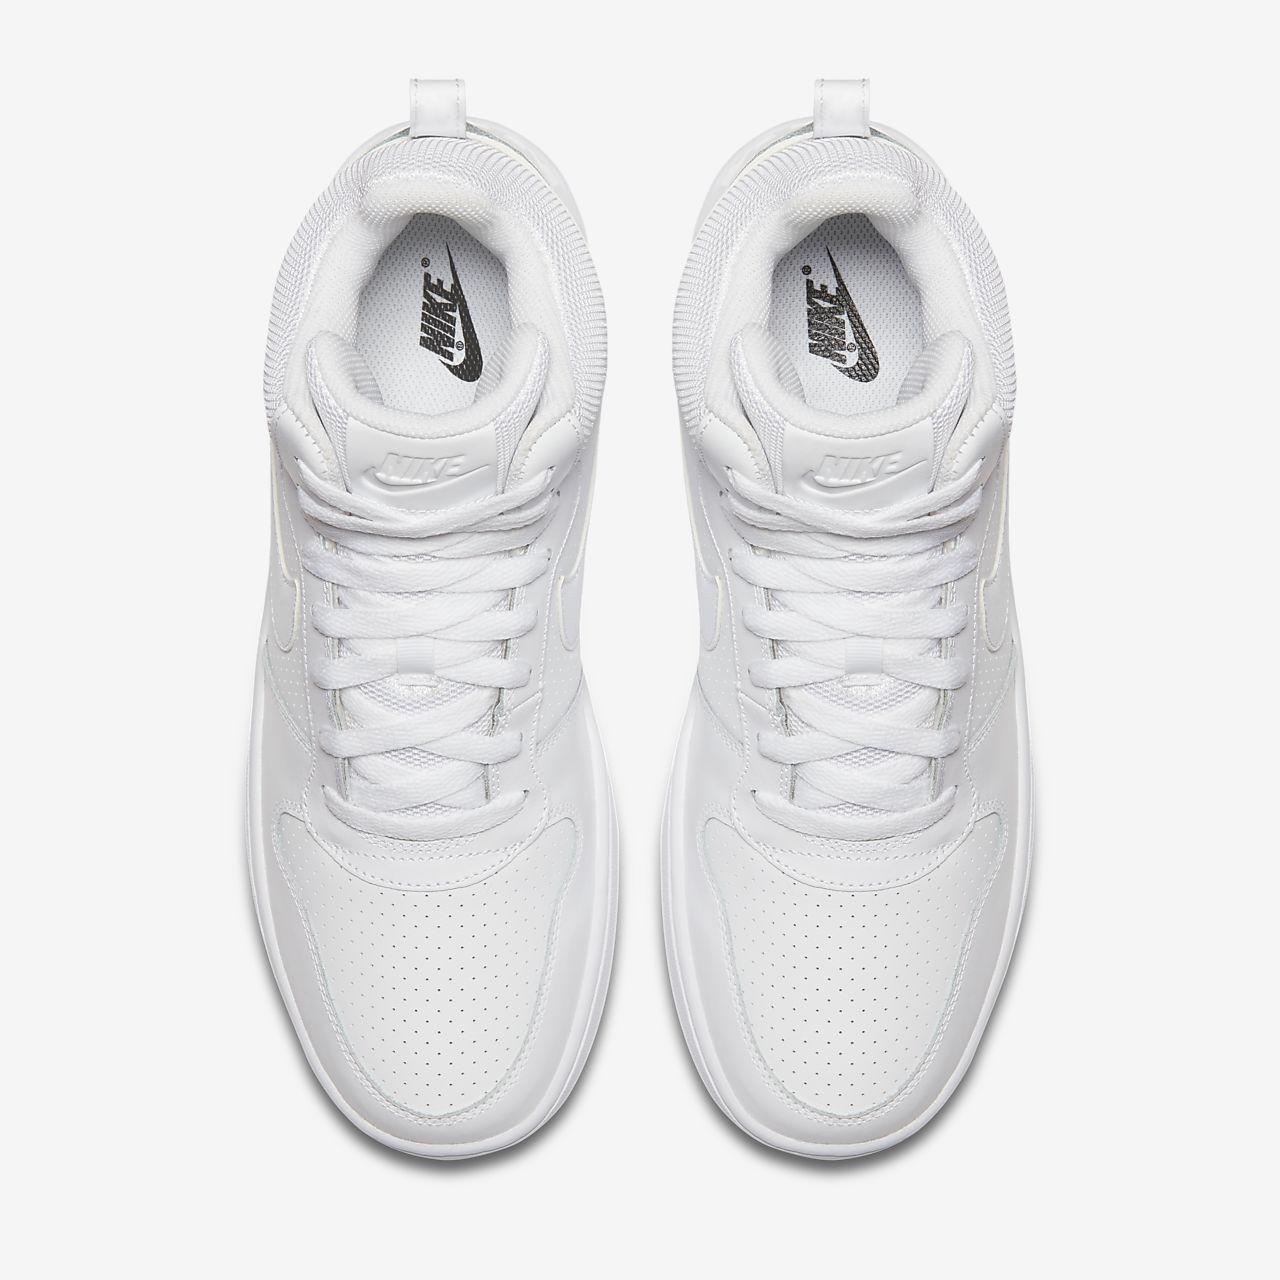 050da67cbf64 Chaussure NikeCourt Borough Mid pour Homme. Nike.com FR